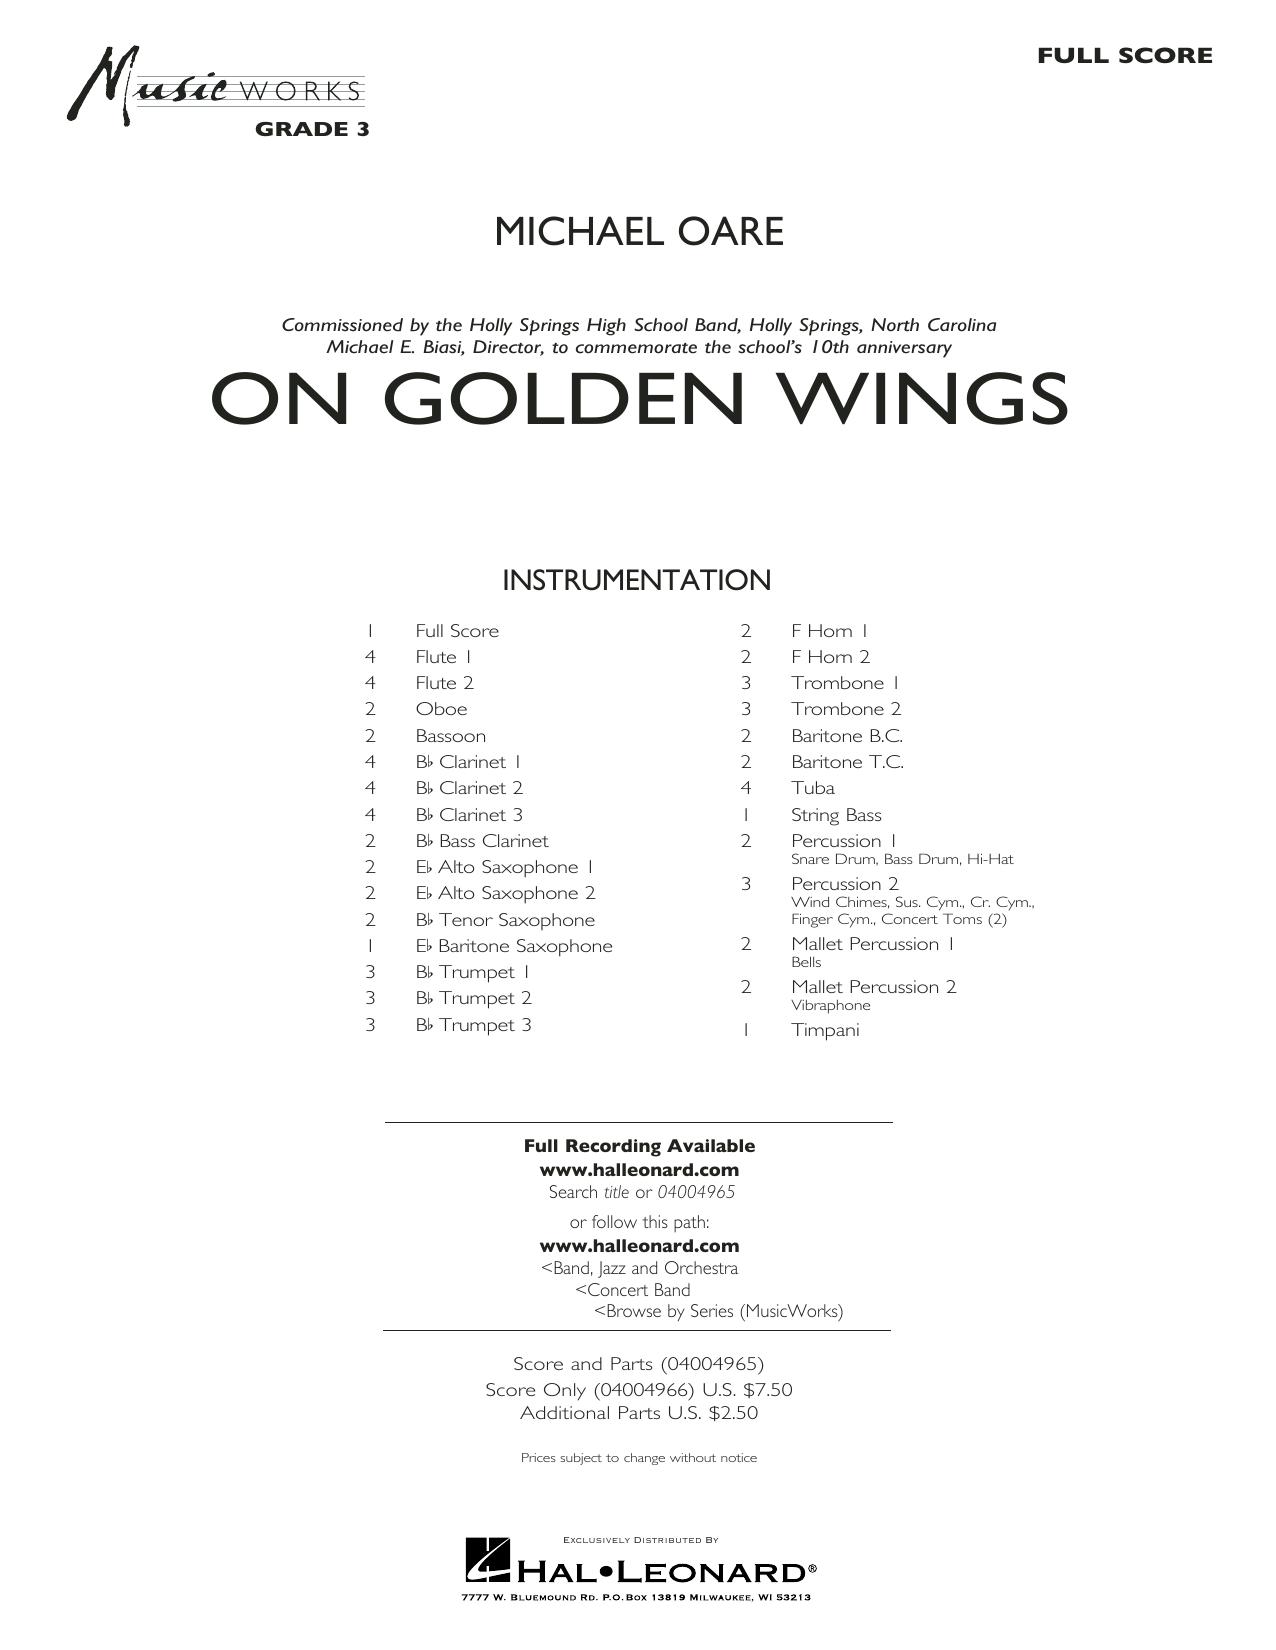 On Golden Wings - Conductor Score (Full Score) Sheet Music